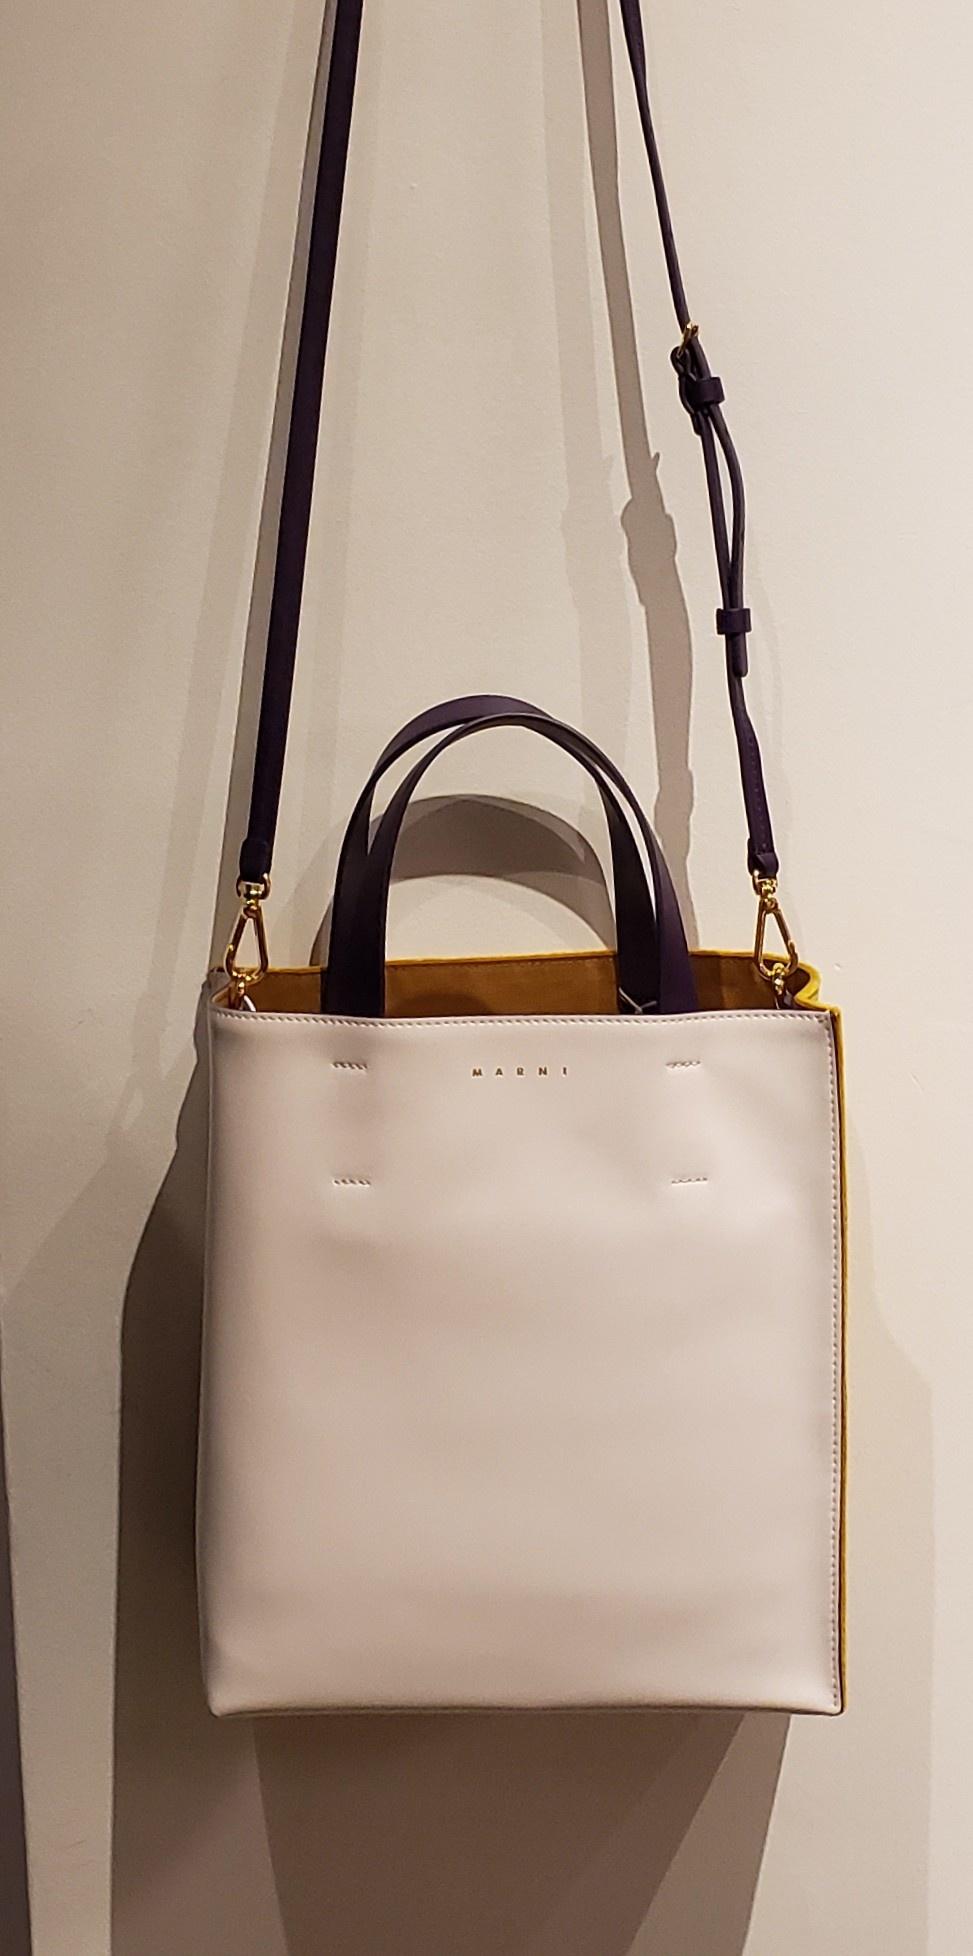 Tote Bag - Museo - Ochre/White-2